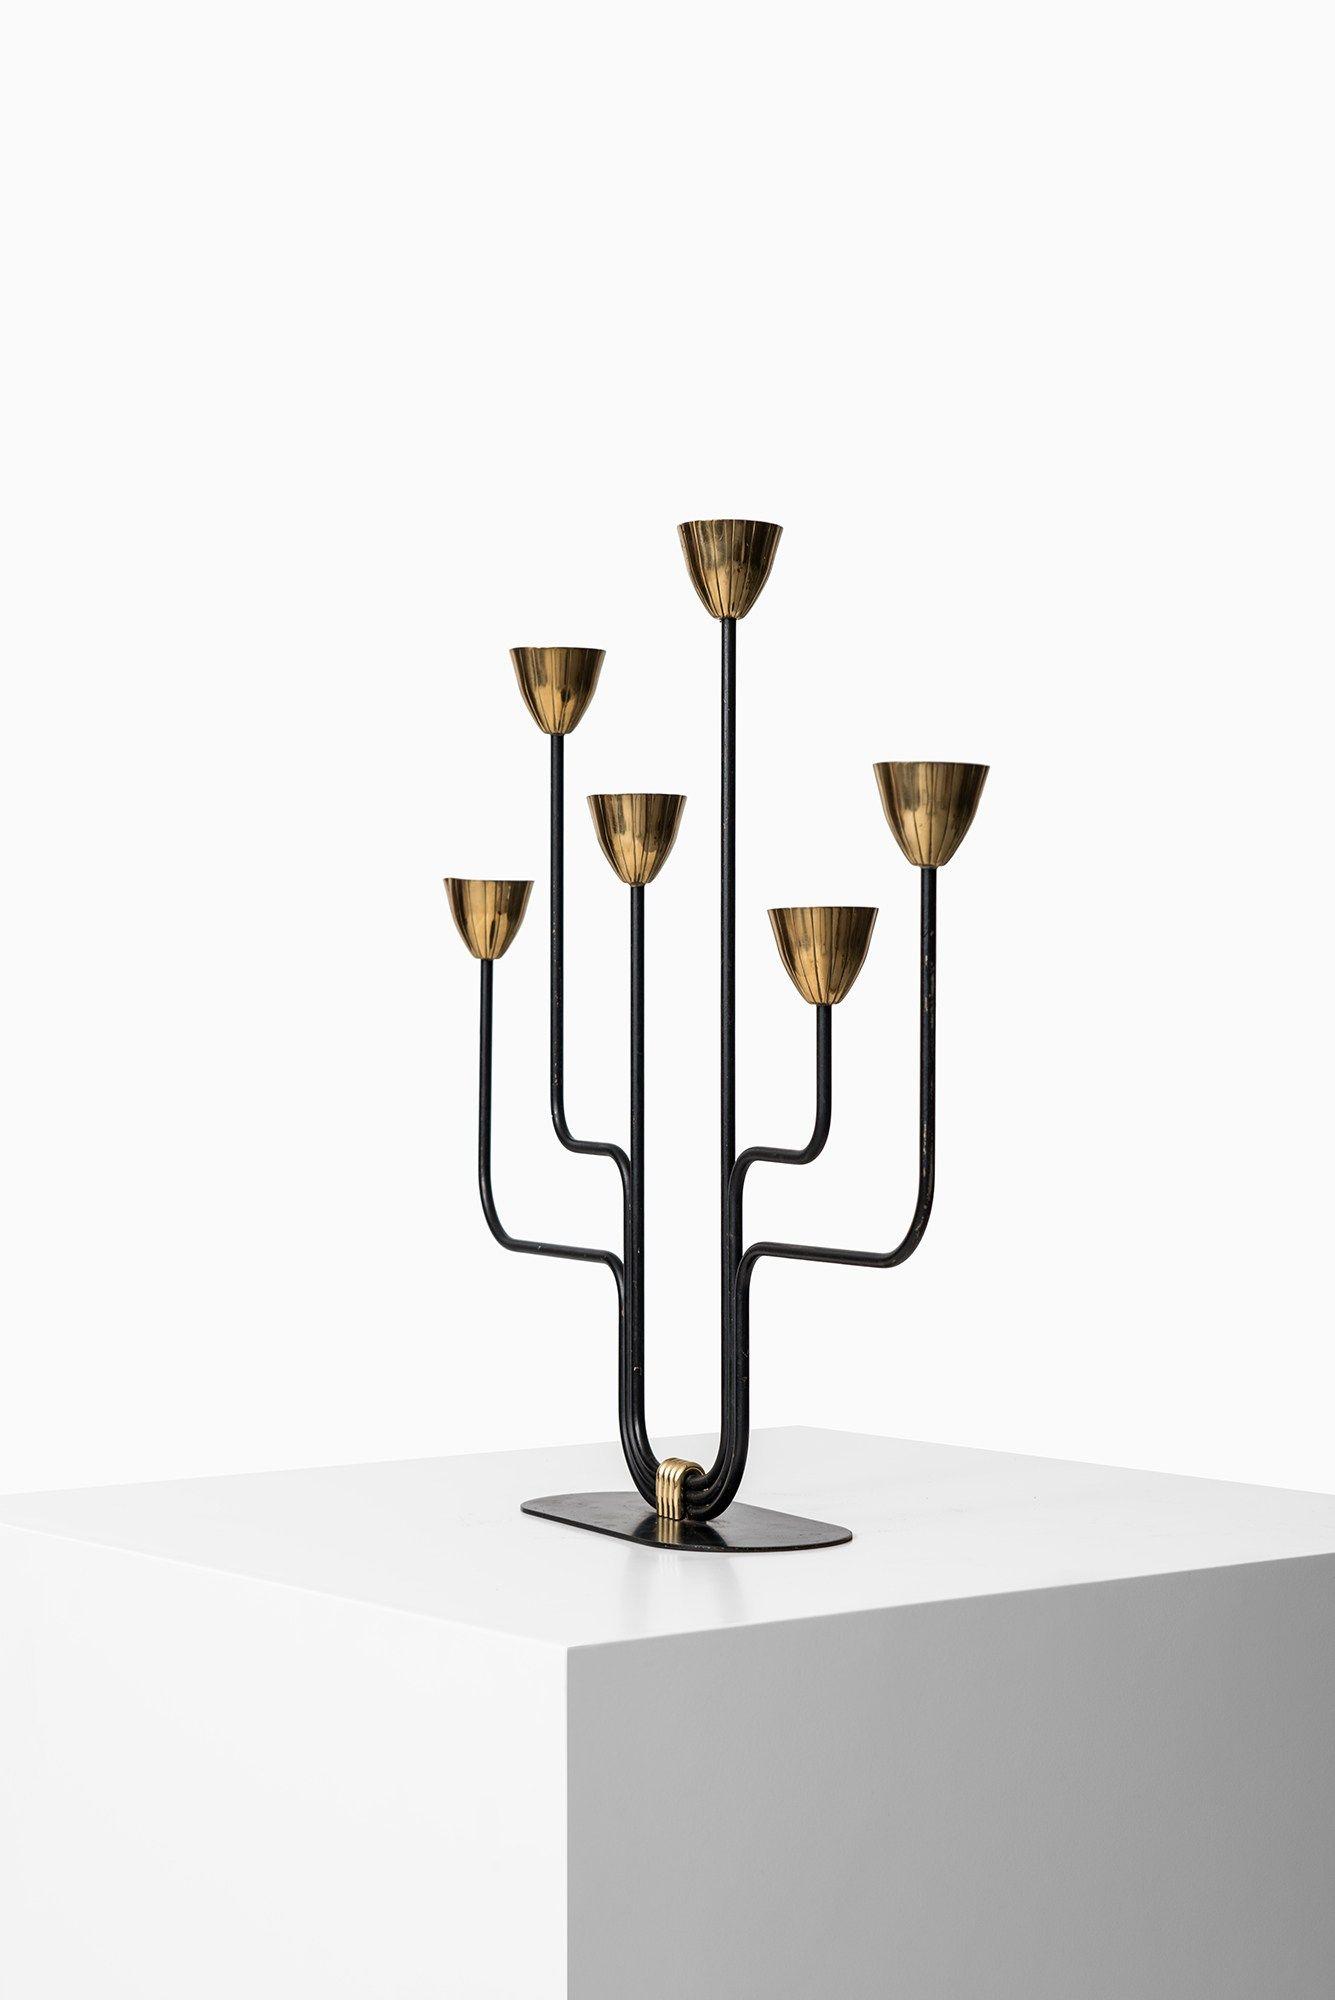 Gunnar ander candlestick studio schalling pinterest